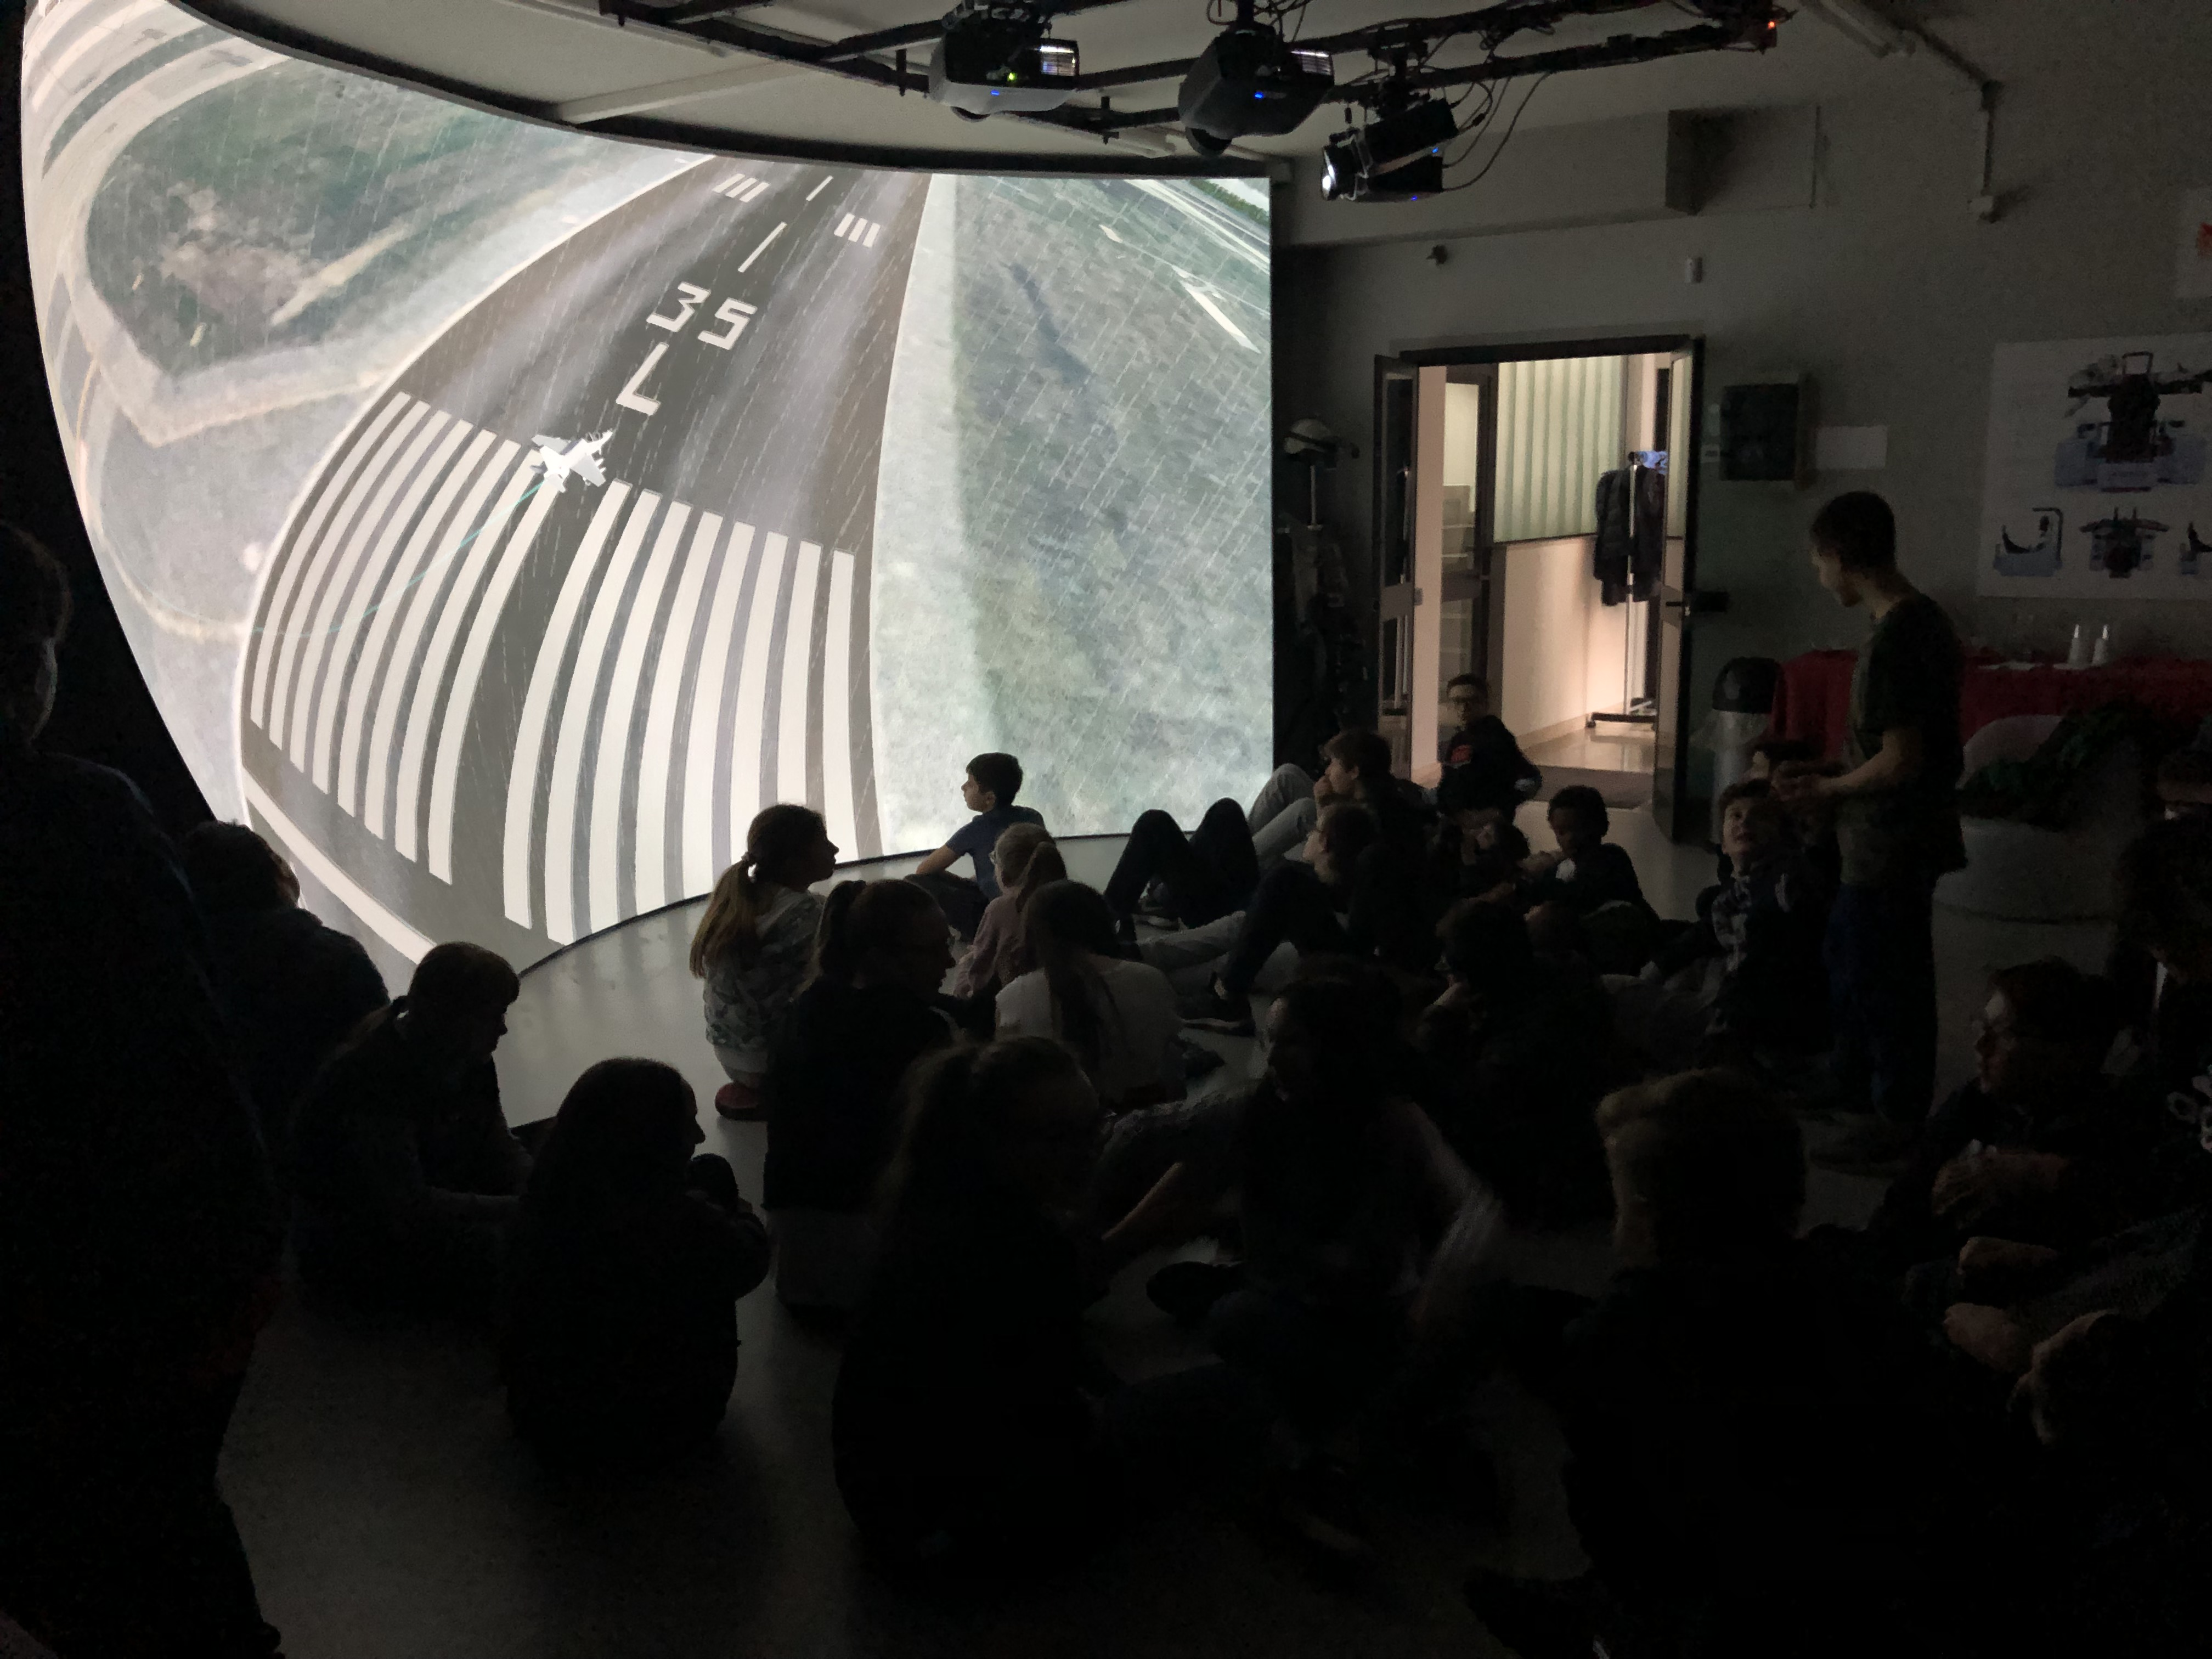 Regional Demo Centre in Italy